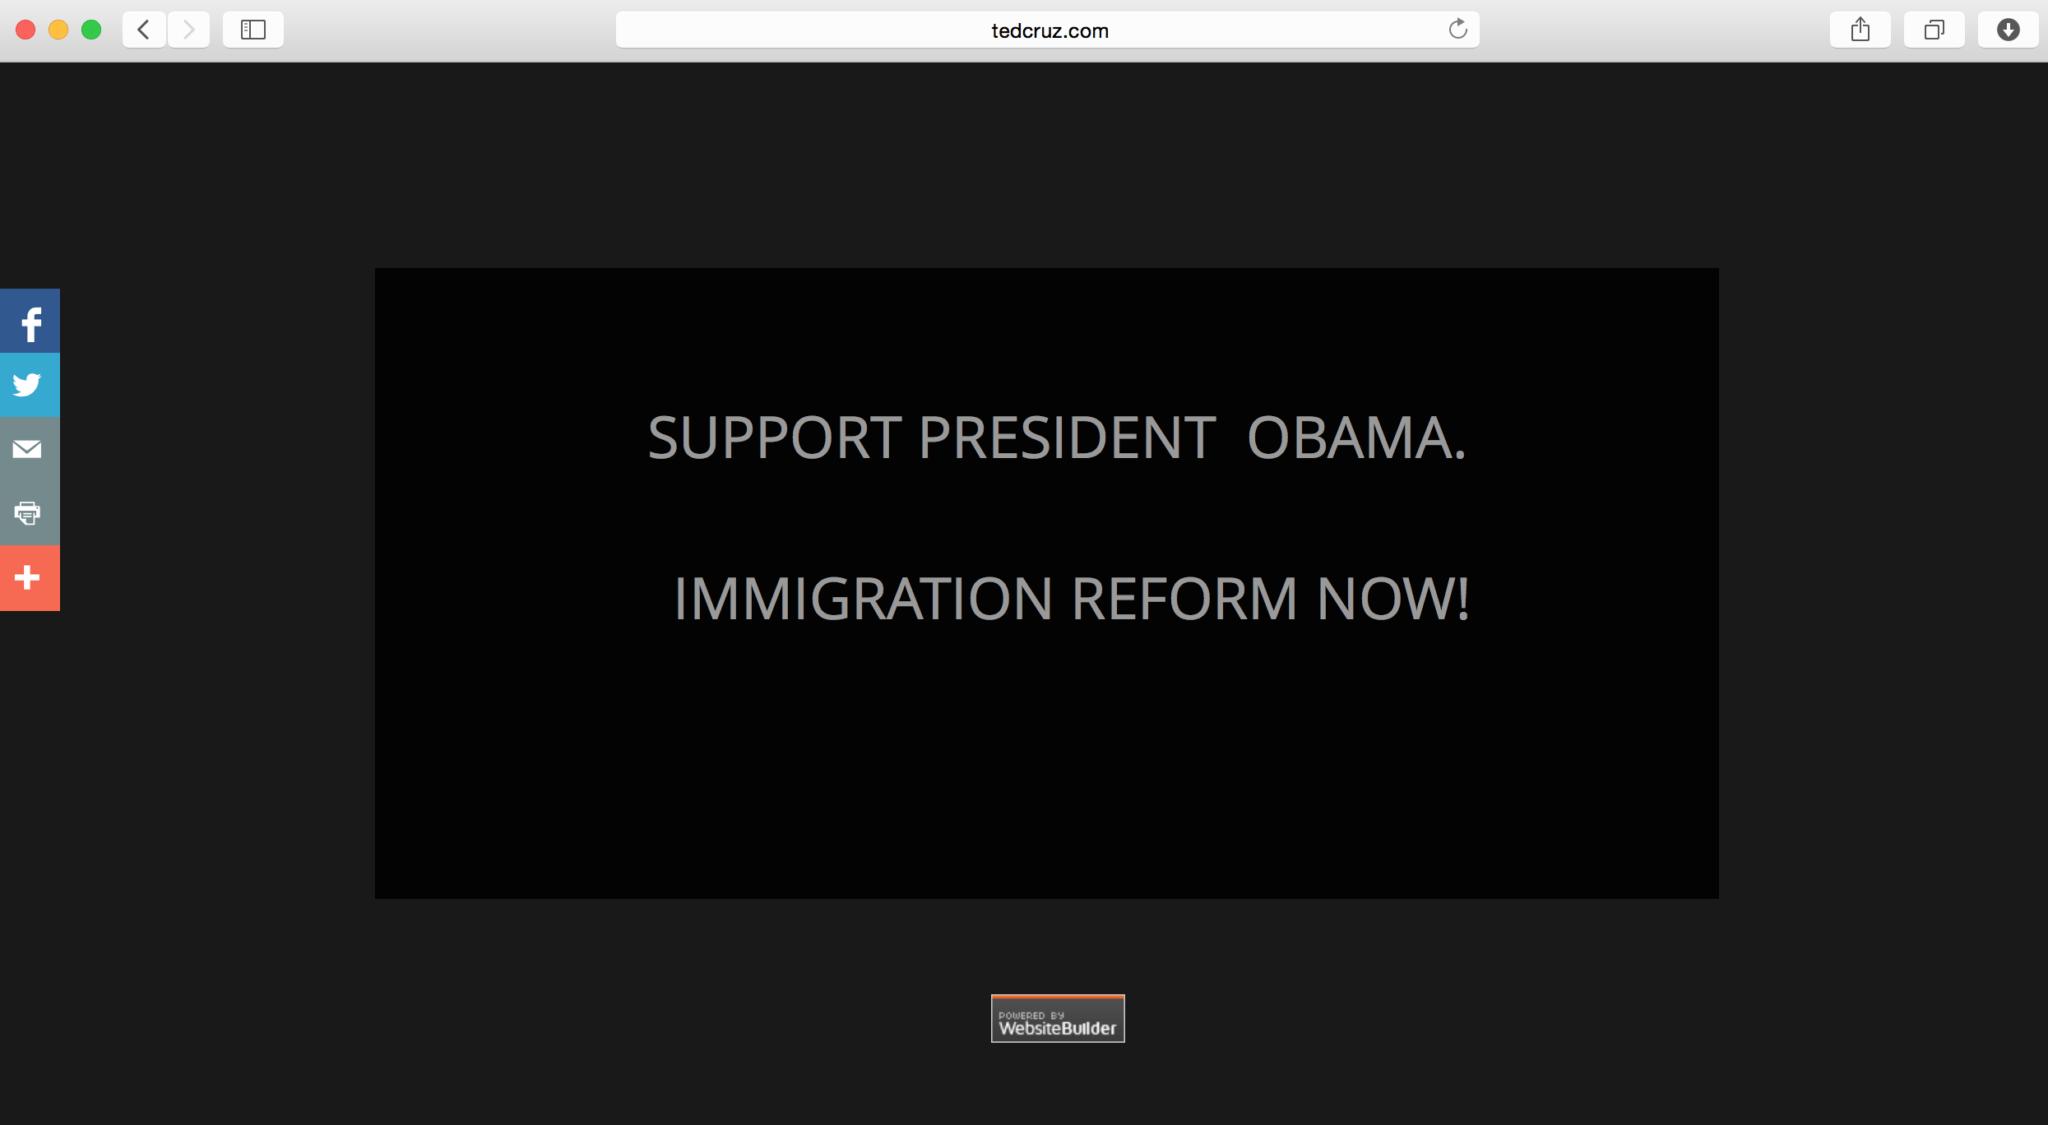 Looks Like Senator Ted Cruzs Digital Team Forgot To Secure Tedcruz